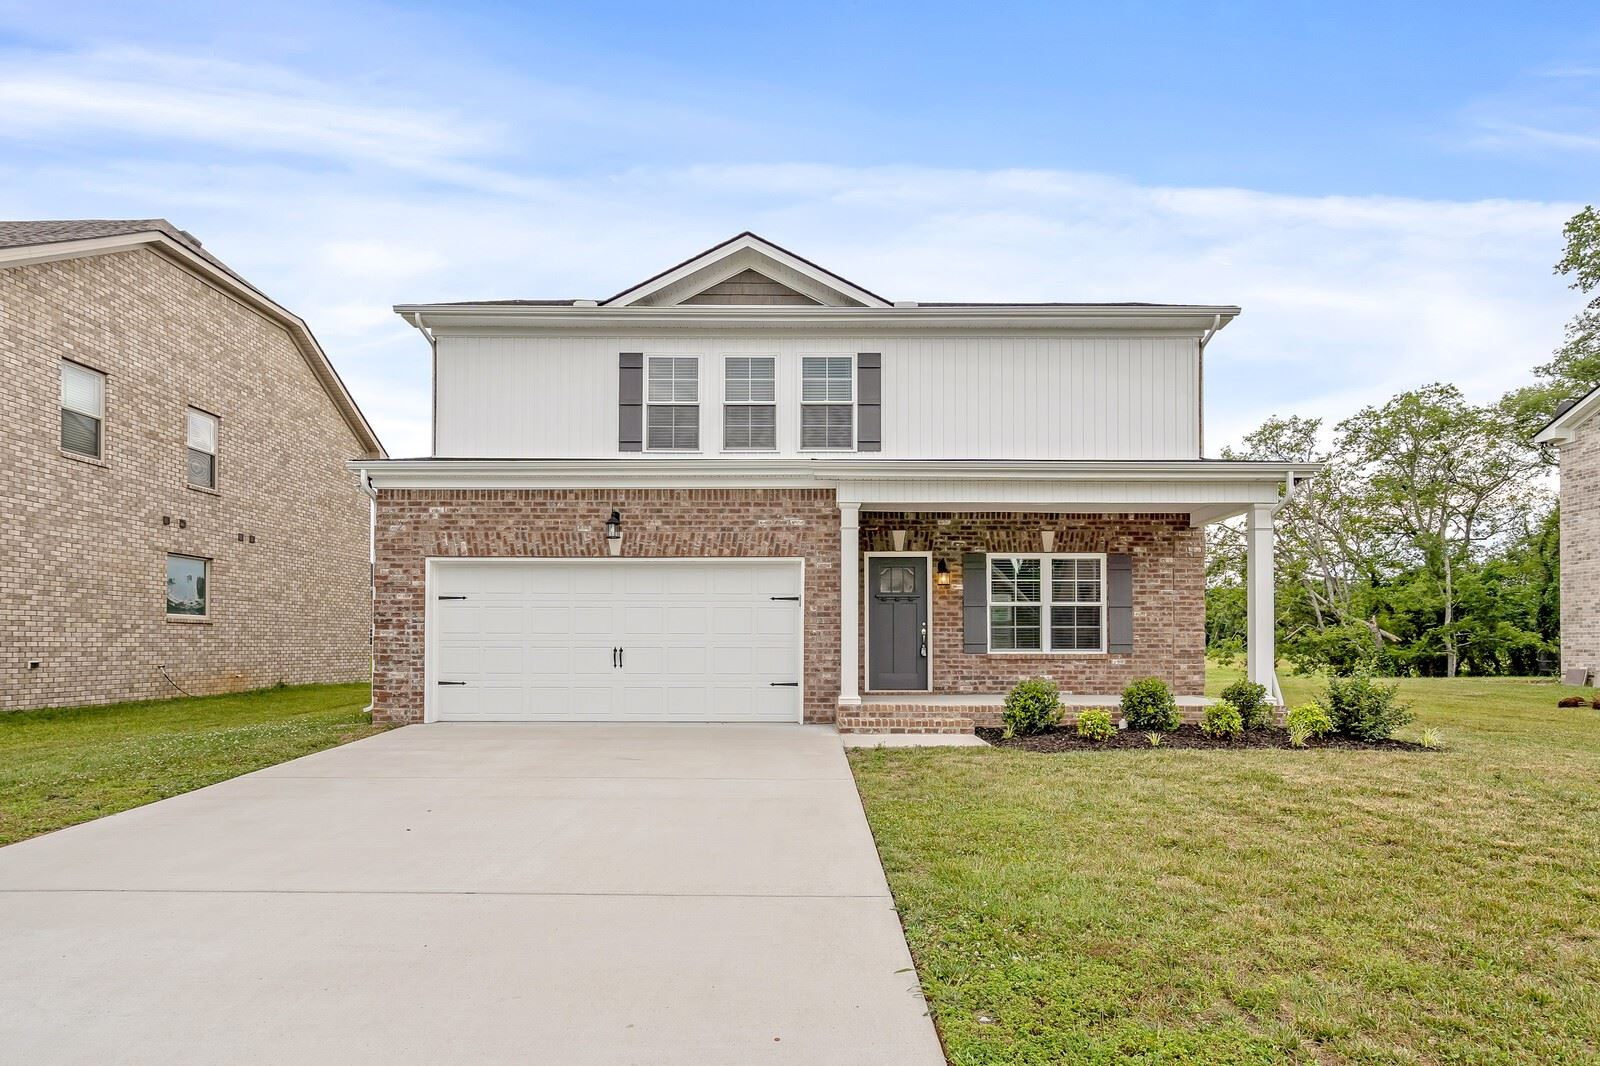 533 Ruby Oaks, Murfreesboro, TN 37128 - MLS#: 2162767